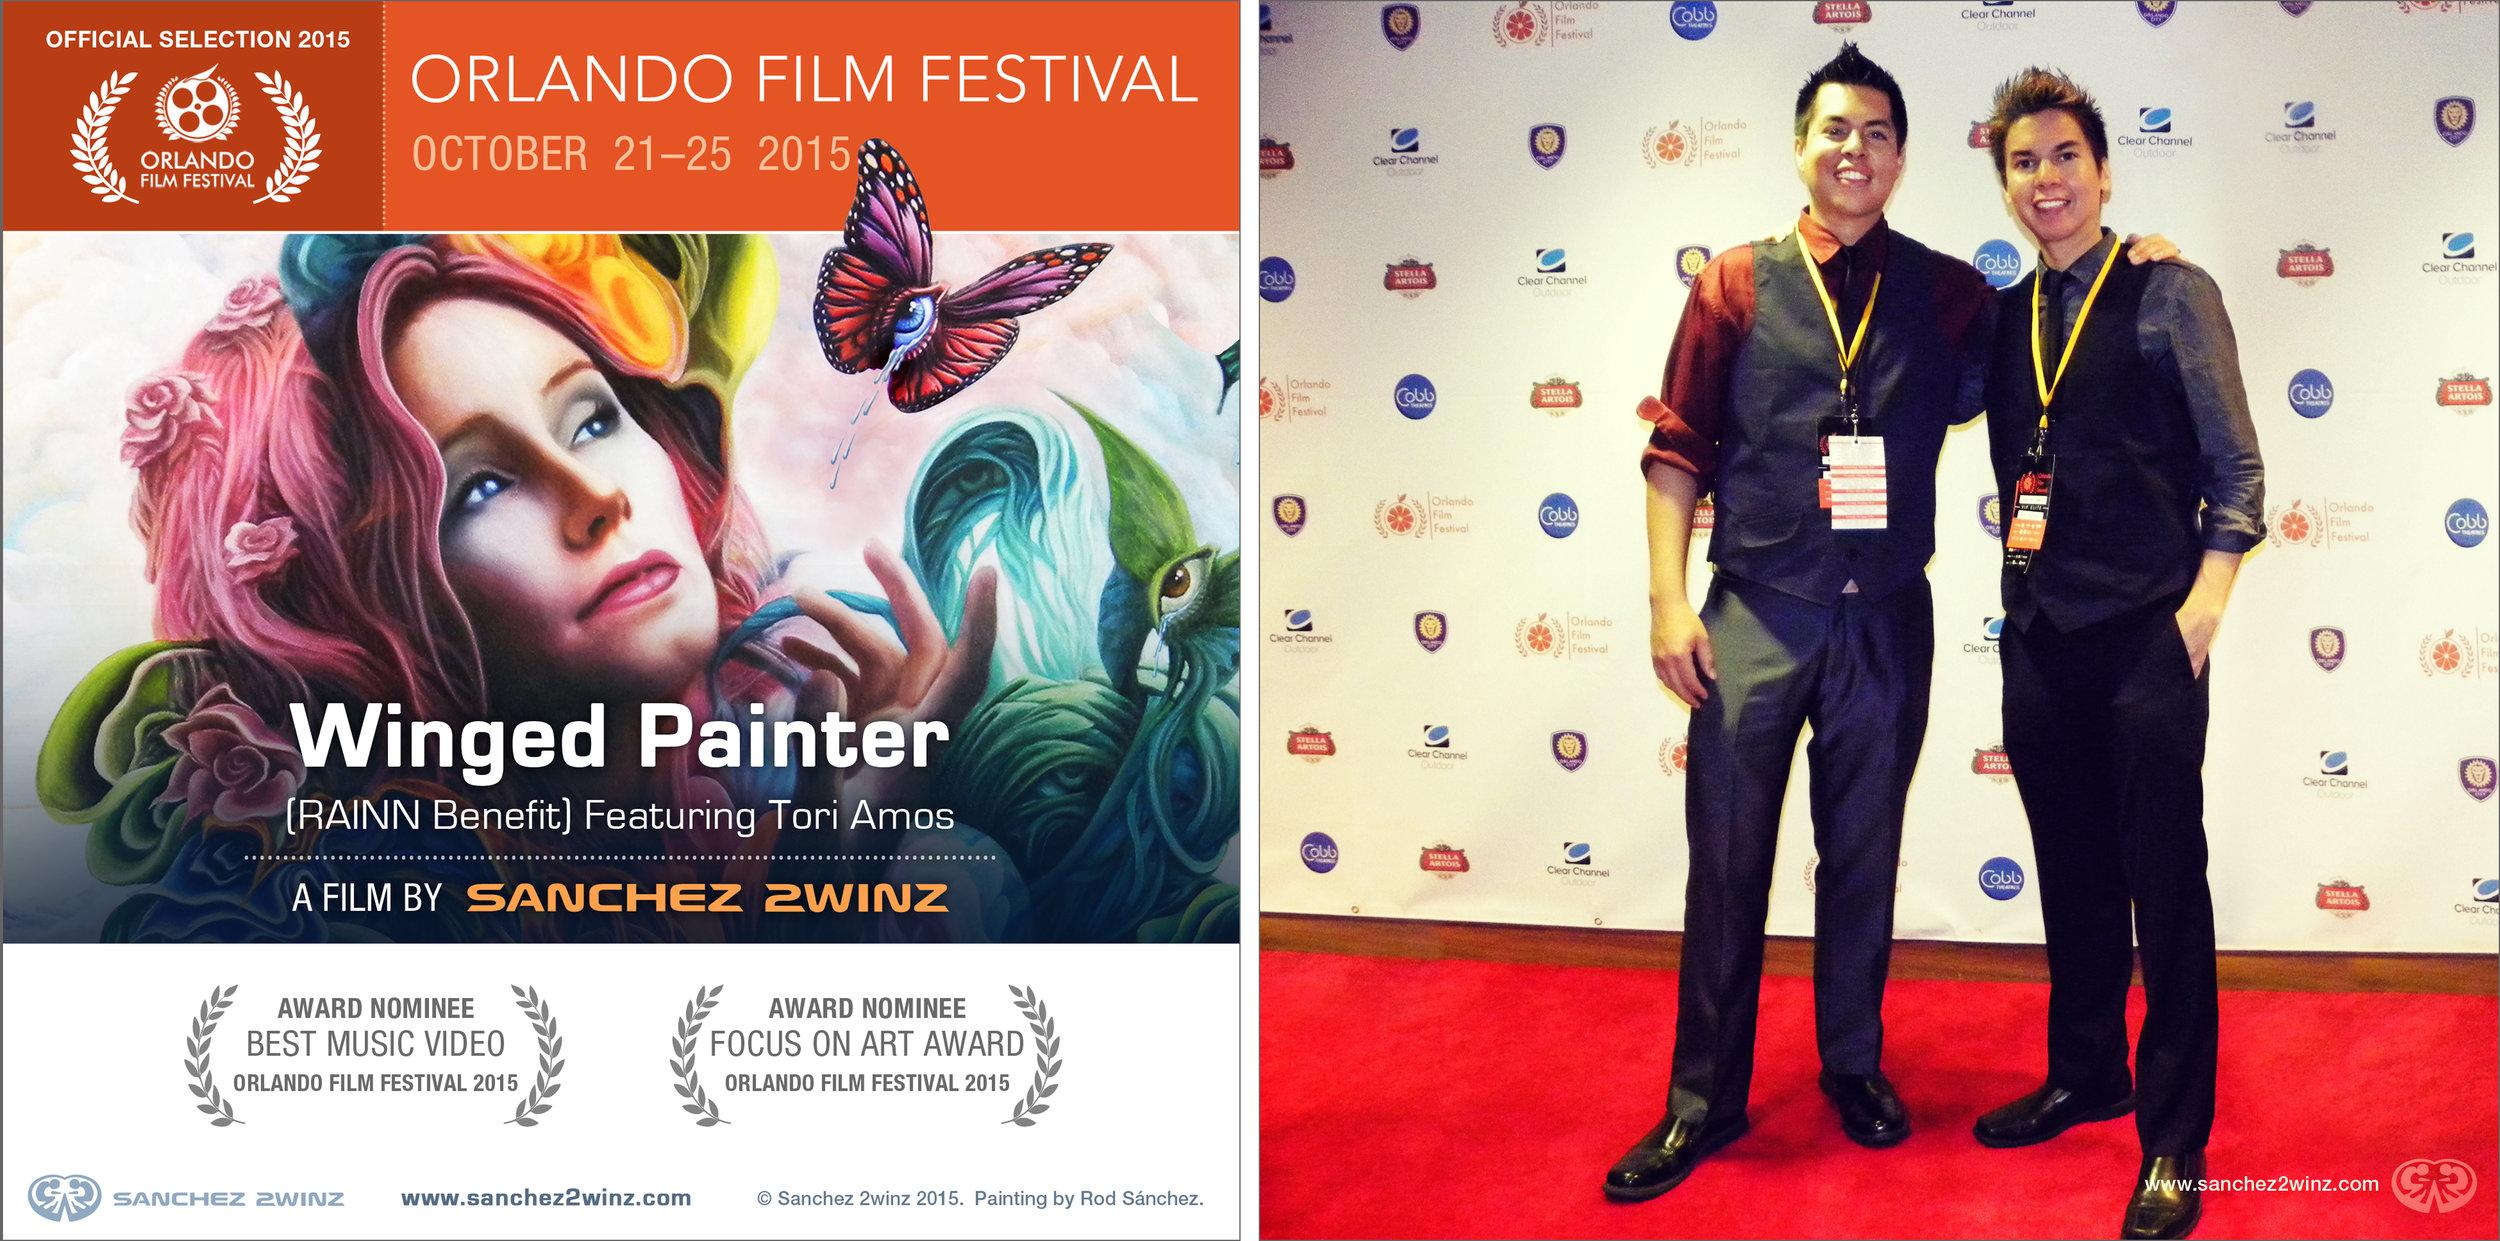 News_OrlandoFilmFestival_WingedPainter_RodSanchez_Sanchez2winz.jpg